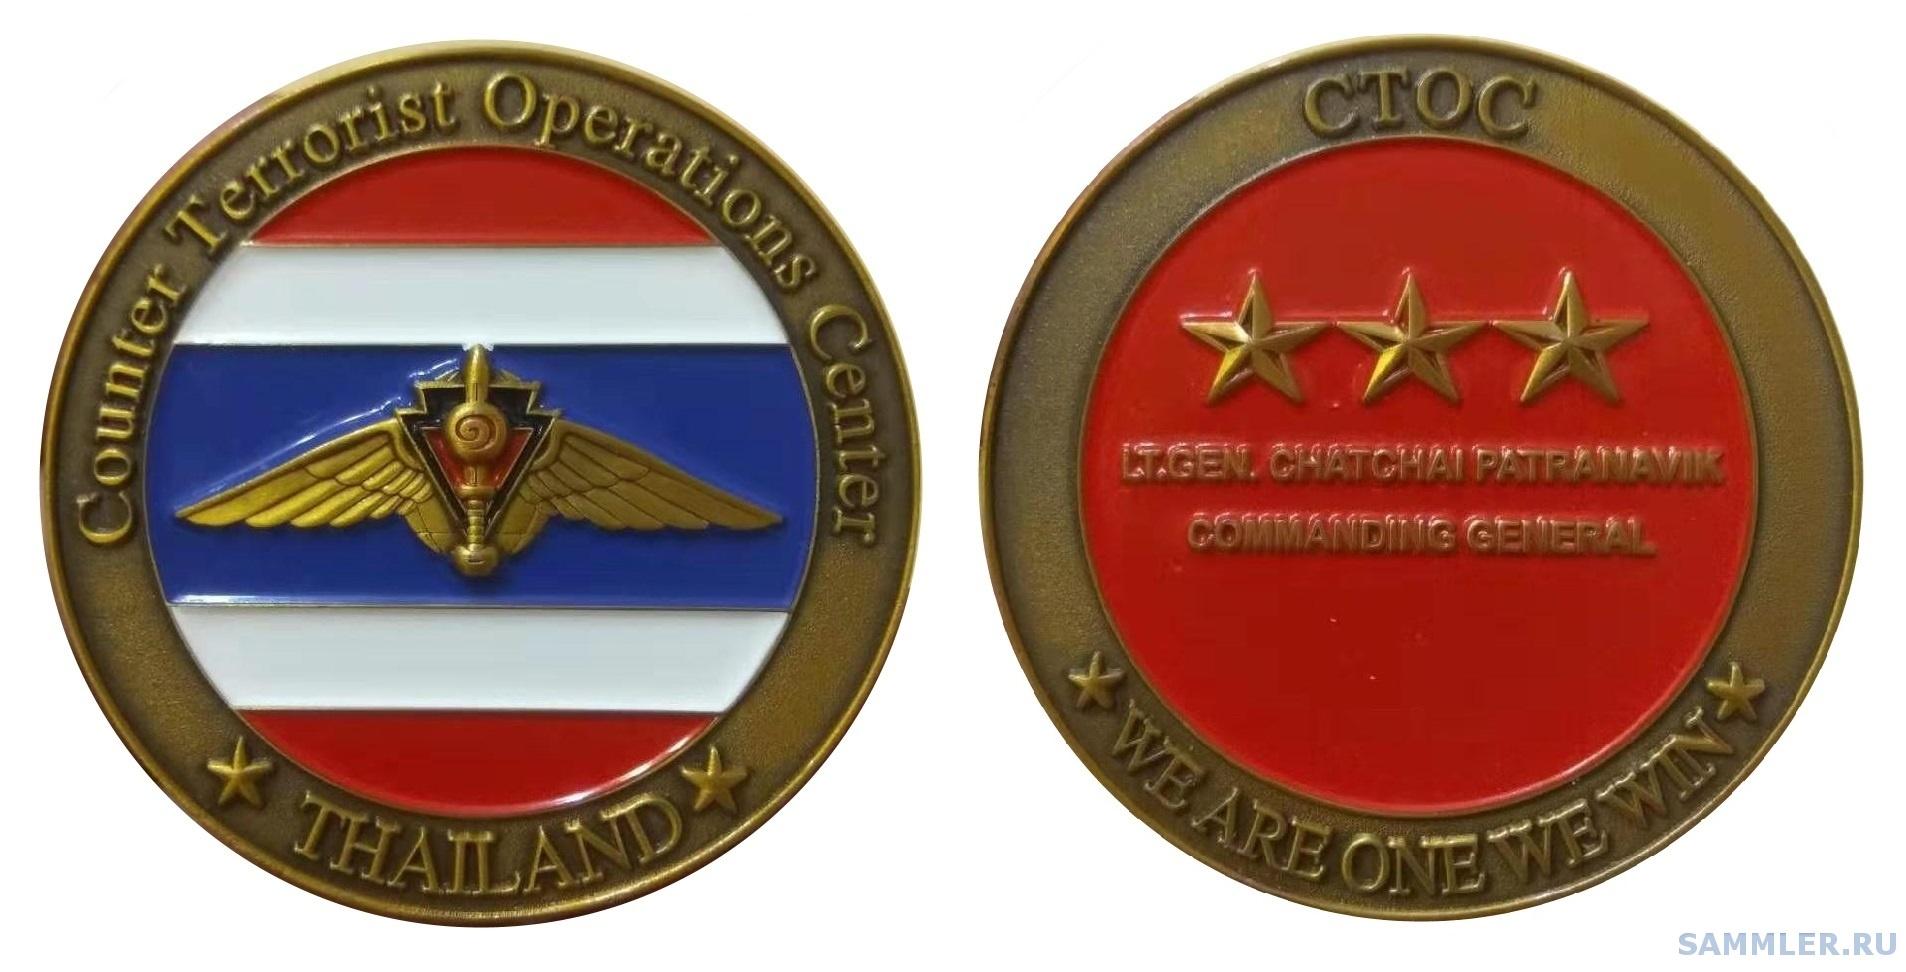 THAILAND Counter Terrorist Operations Center (CTOC) #231257.jpg